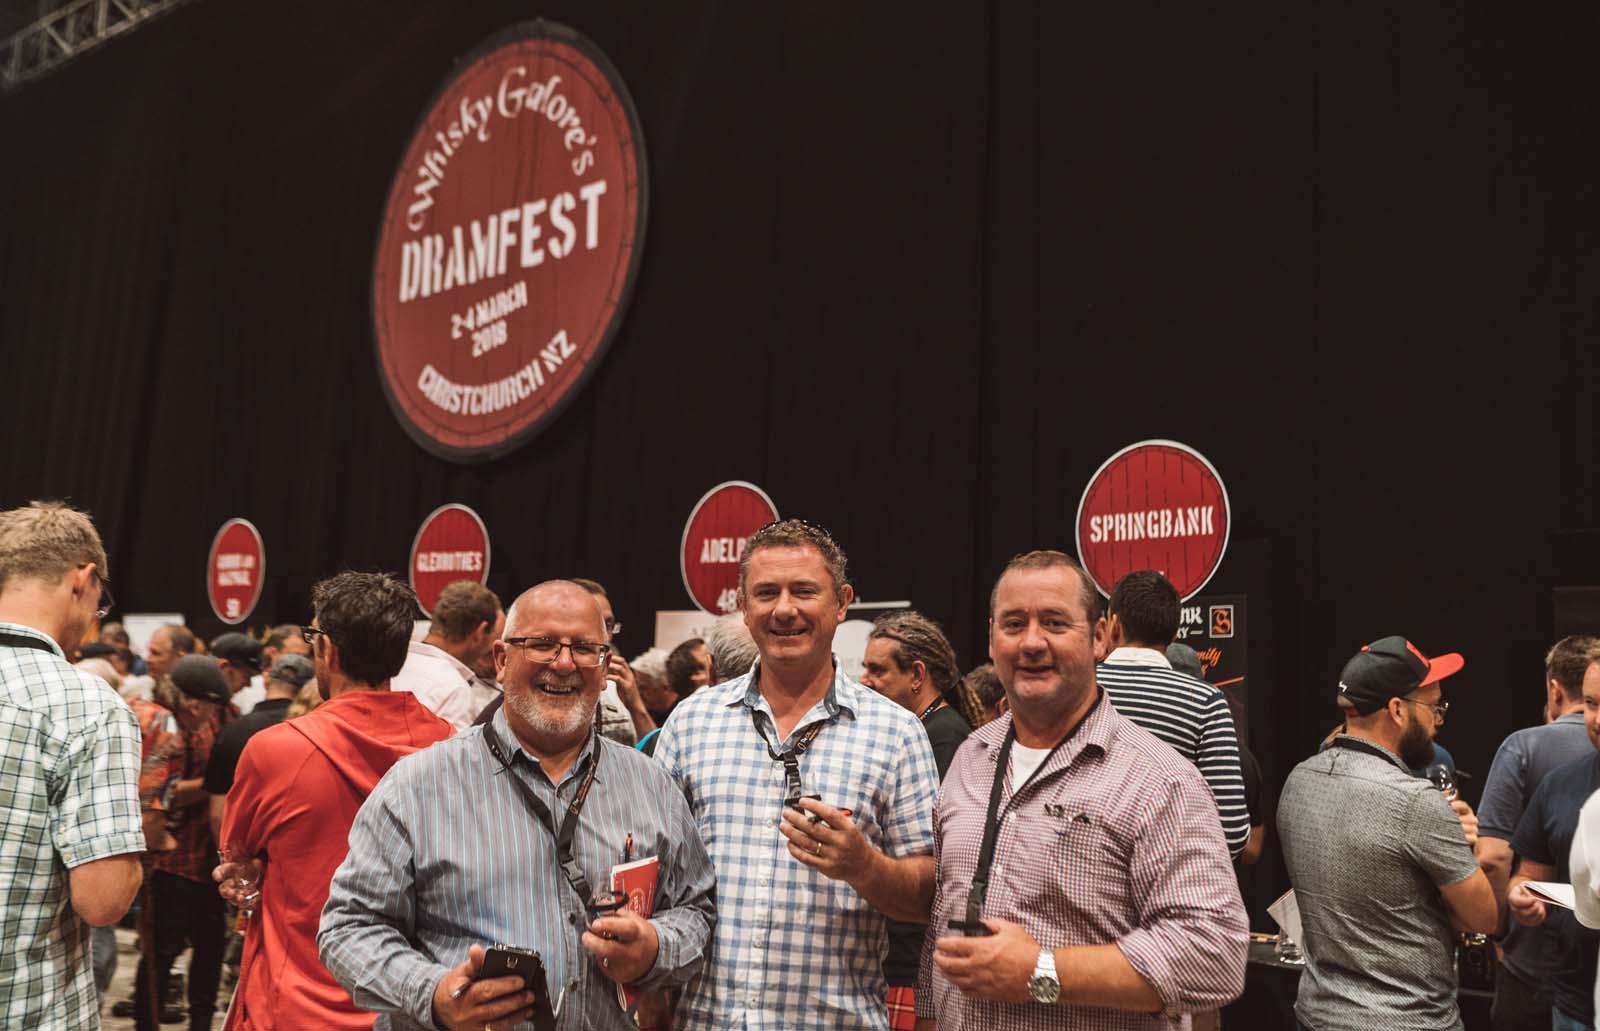 Dramfest 2018 for Whisky Galore-394.jpg